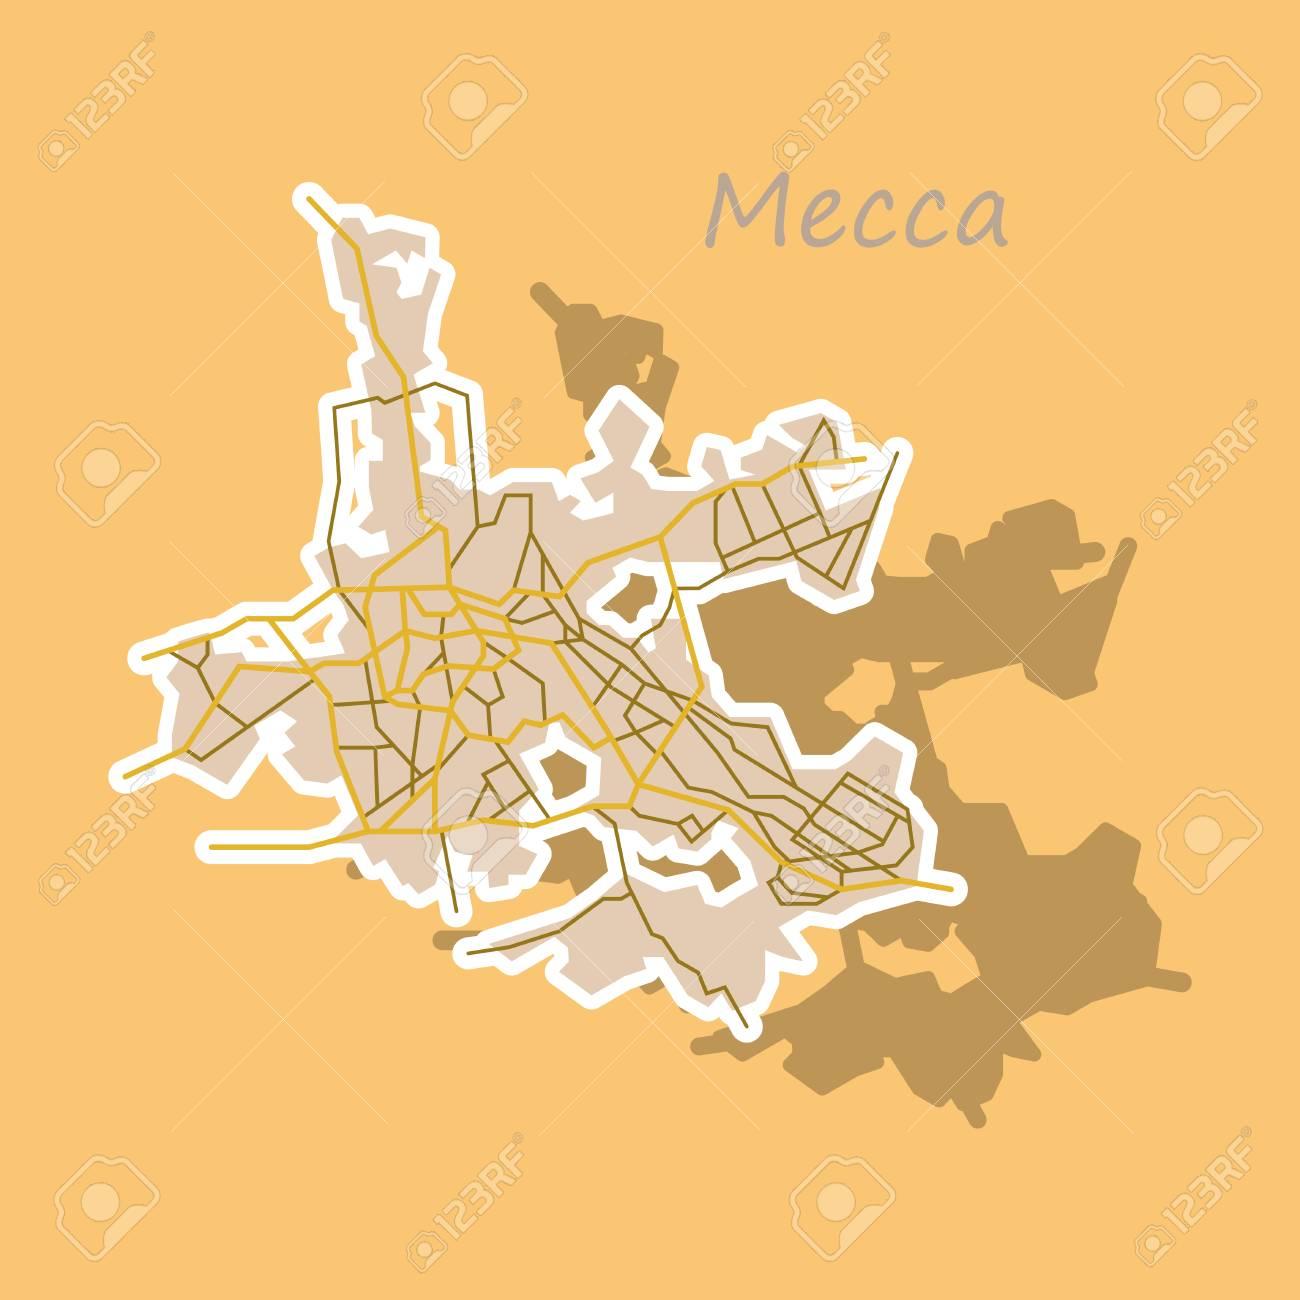 Mecca Map Saudi Arabia, Sticker Illustration. Royalty Free Cliparts ...